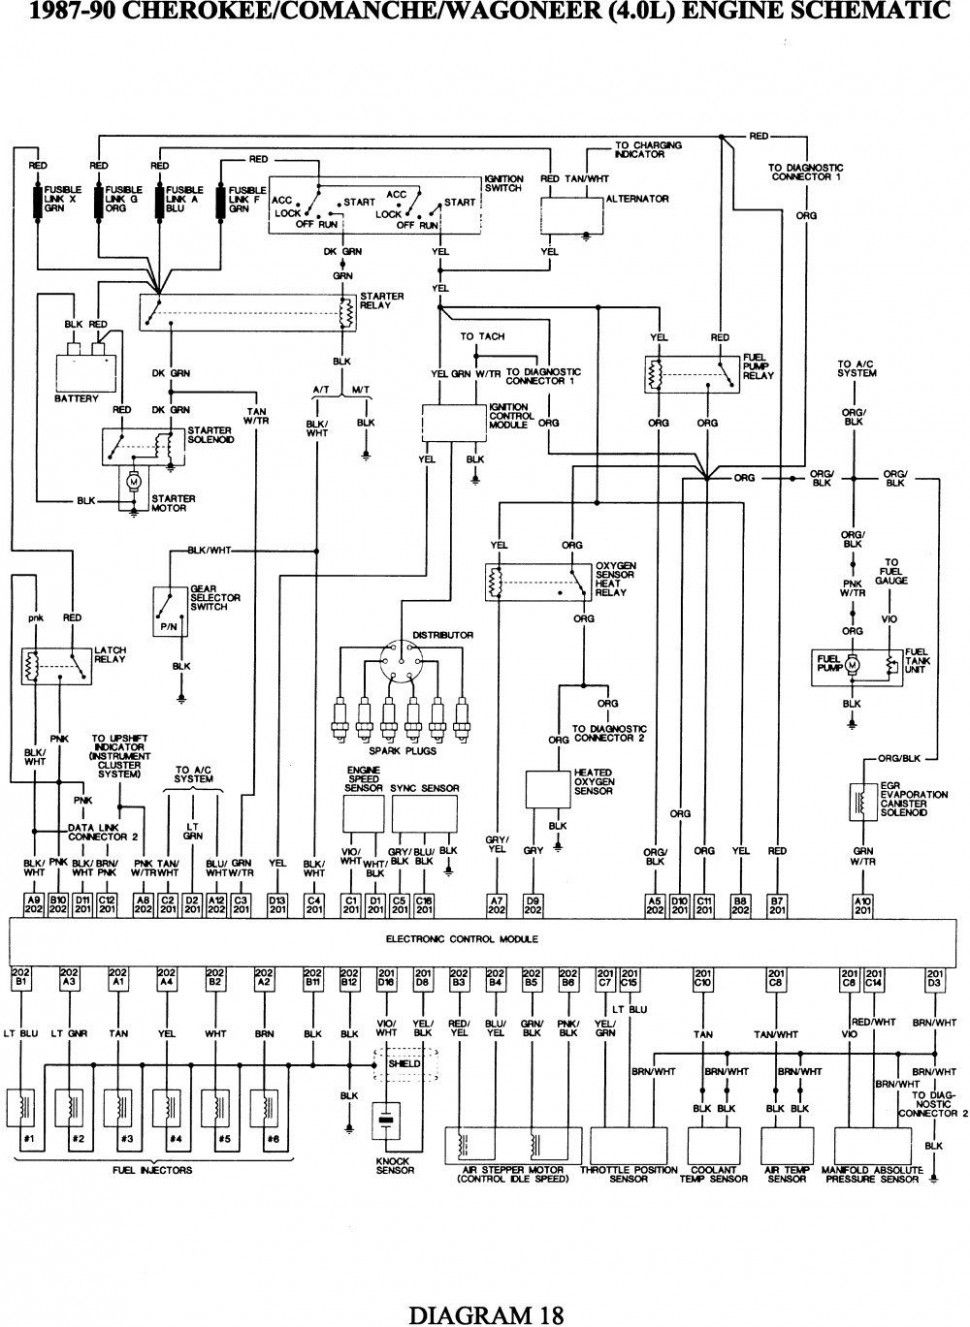 5 Jeep Wrangler 5.5 Engine Diagram 5 Jeep Wrangler 5.5